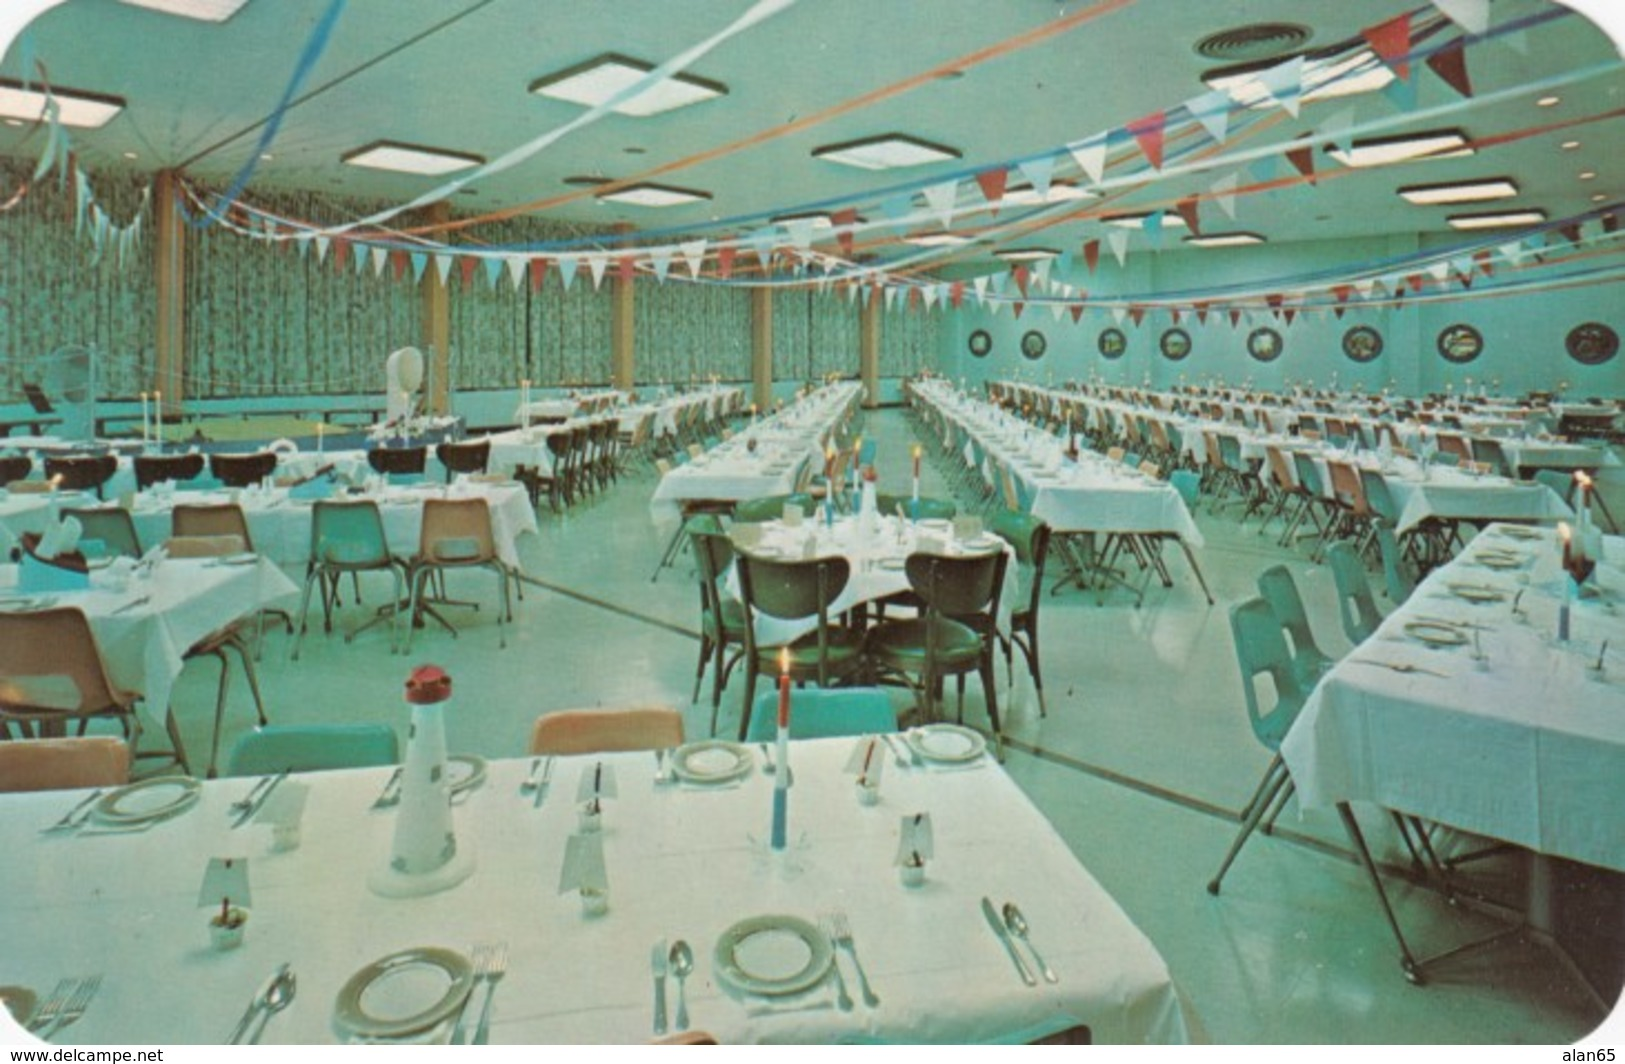 Berrien Springs Michigan, Andrews University Wolverine Room Campus Health Center, C1950s/60s Vintage Postcard - United States